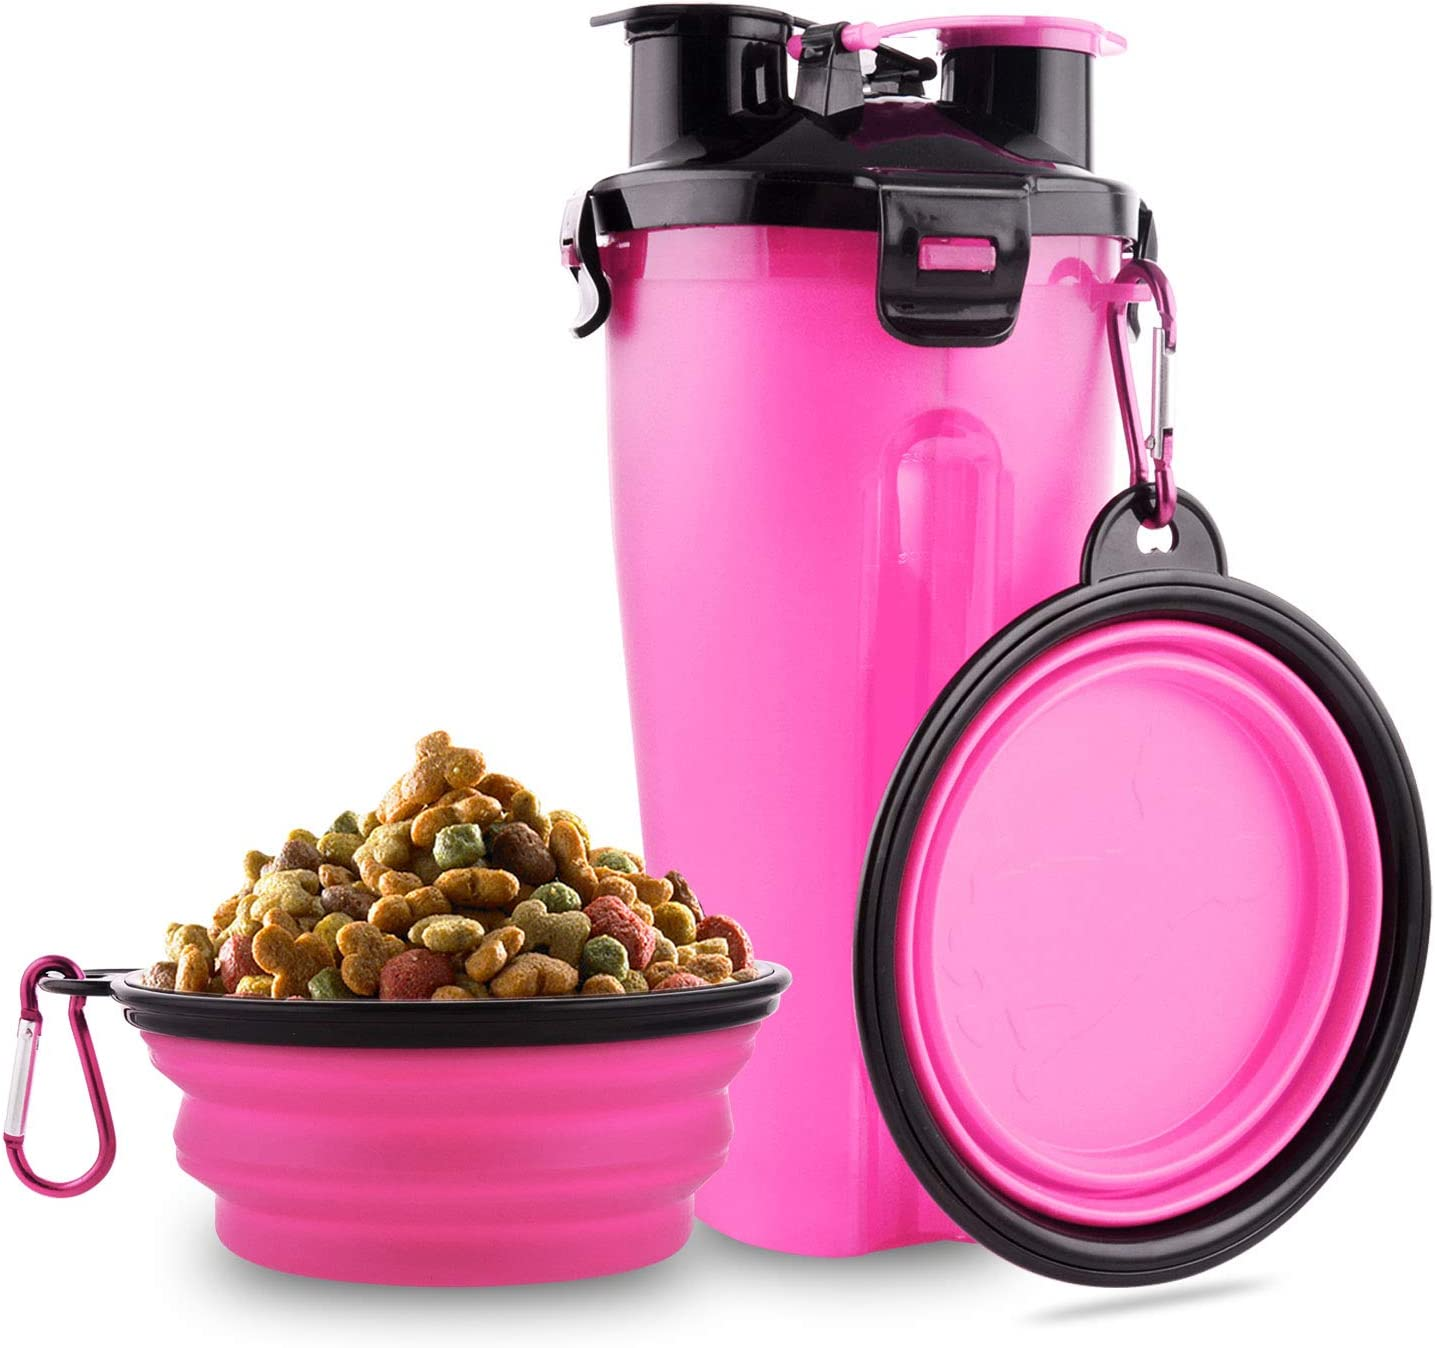 MATT SAGA Botella de Agua para Perros Portatil Envase de Comida para Perros con 2 Plegable Tazones para Perros Gatos Mascotas Adecuado para al Aire Libre Caminar Viajar (Rosa)